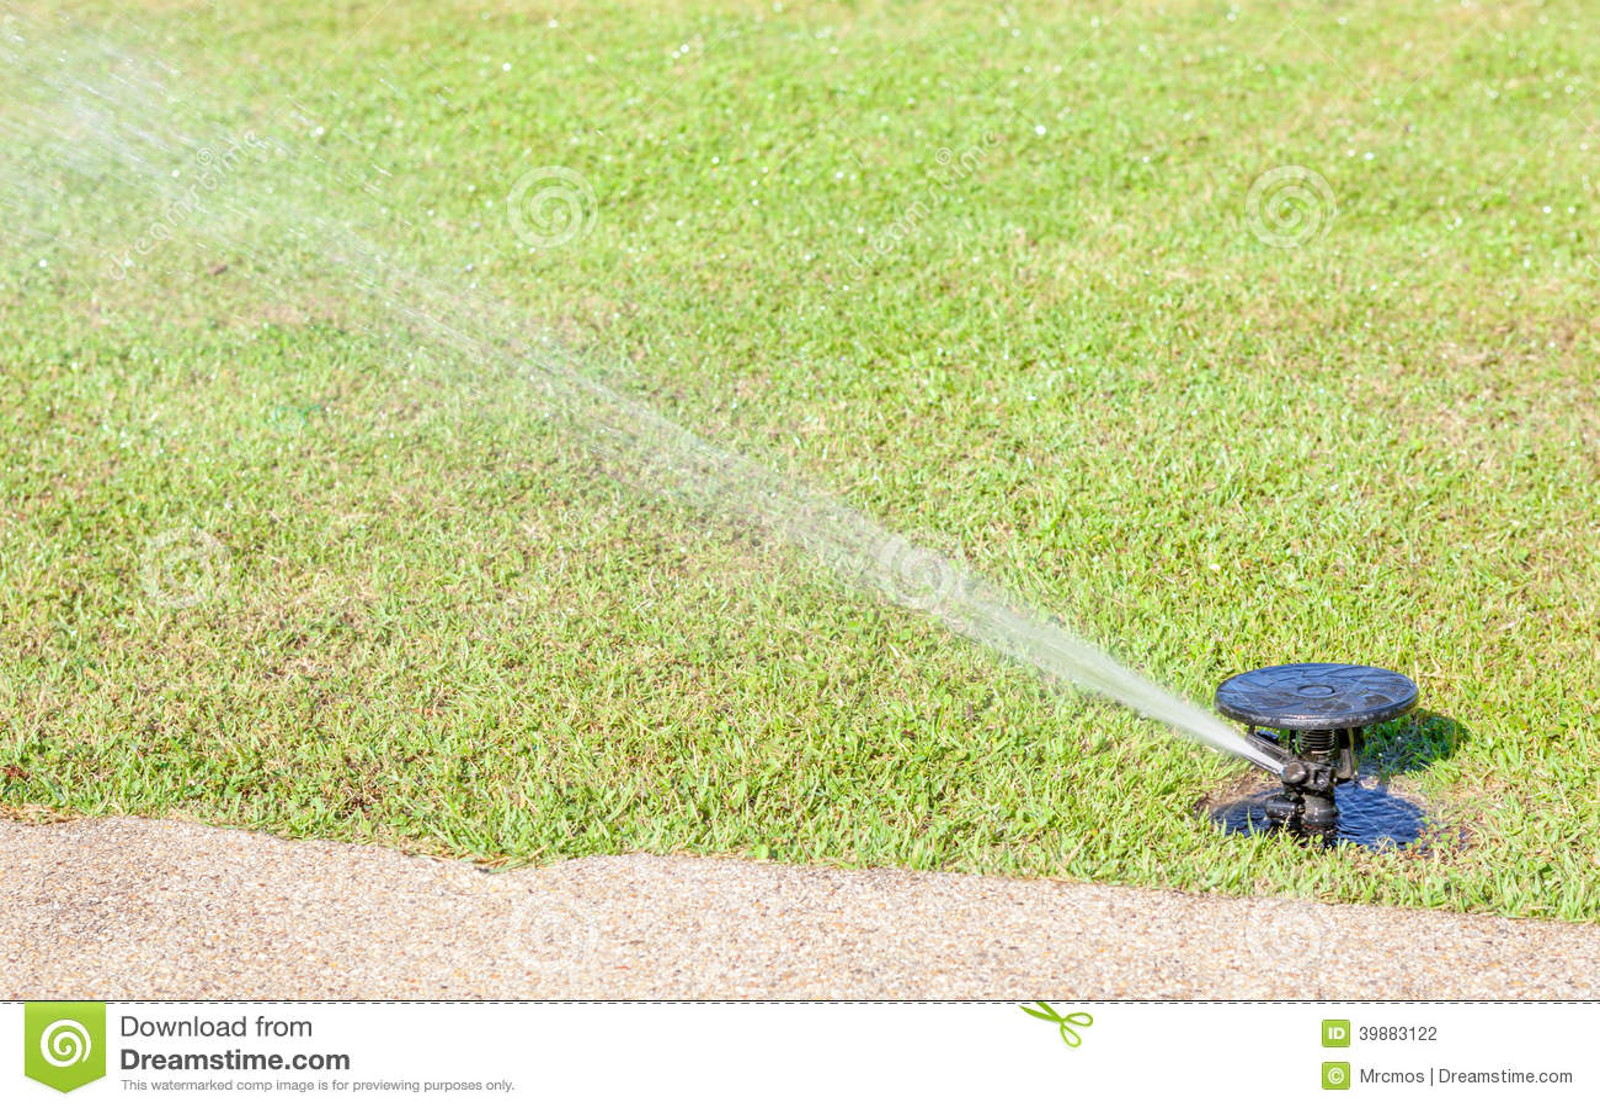 Sprinkler Watering Field Of Green Grass Royalty Free Stock